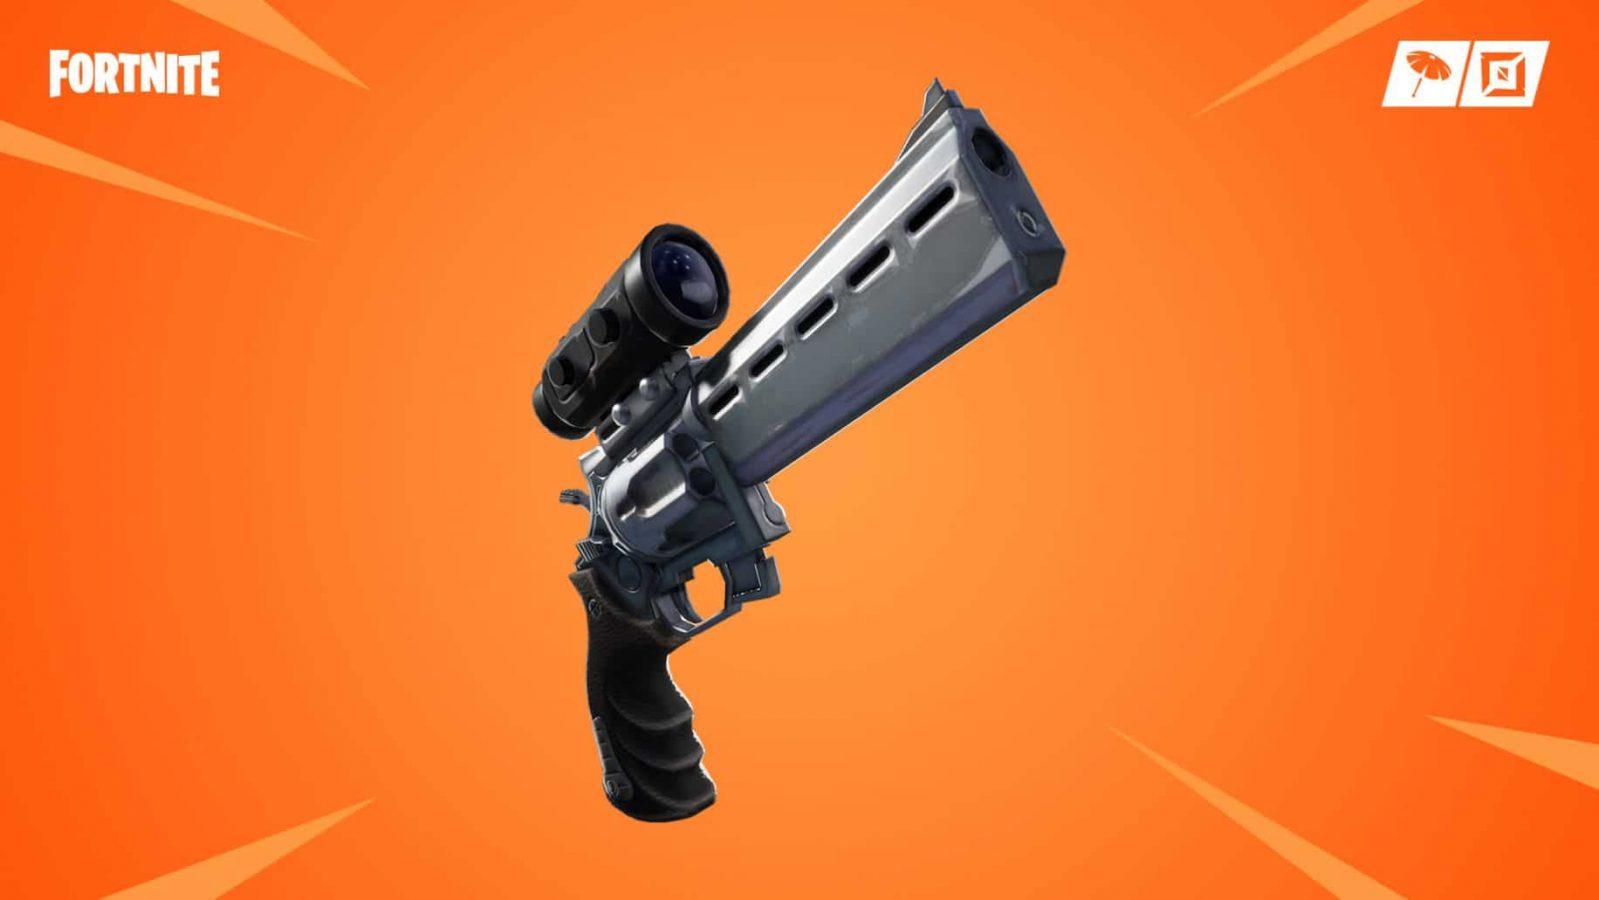 fortnite scoped revolver on orange background